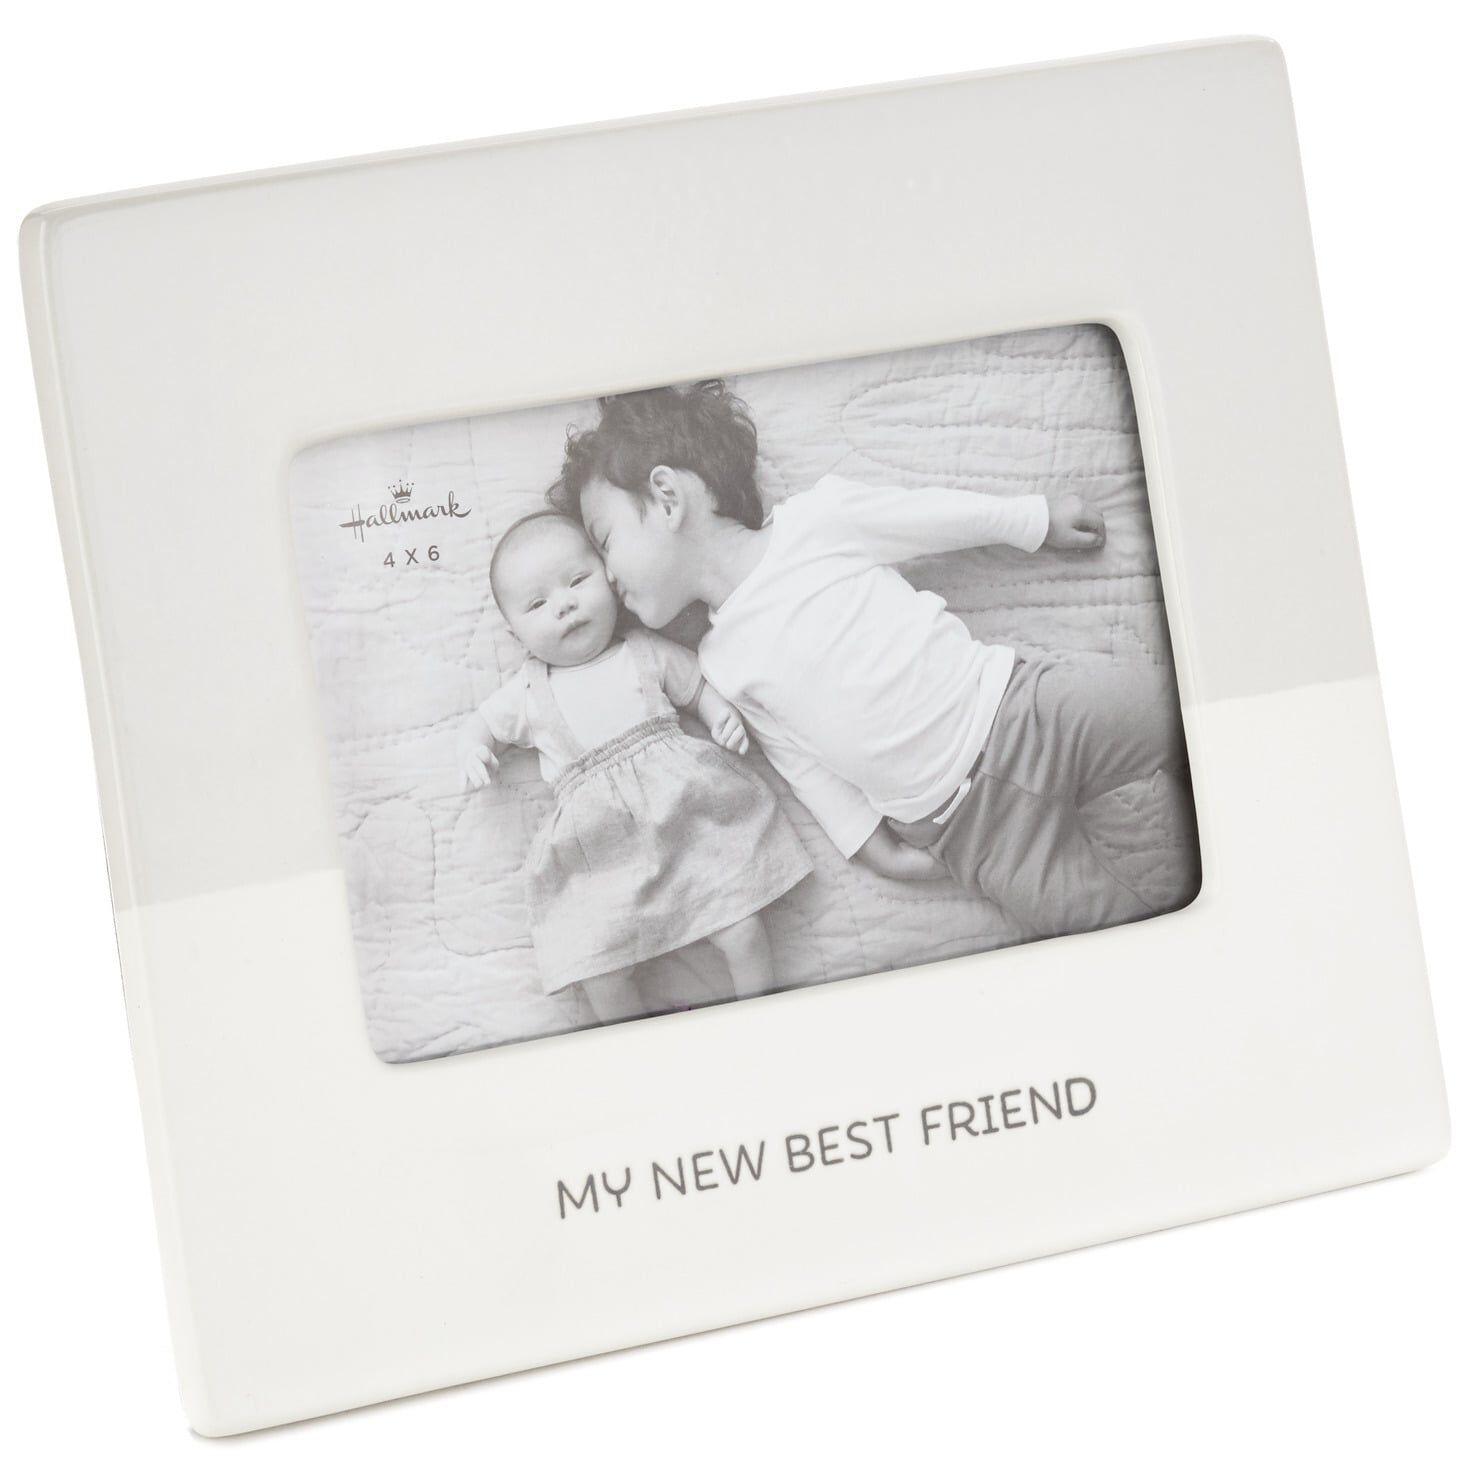 Better Crafts Cardboard Photo Folder 4x6 Pack of 100 White